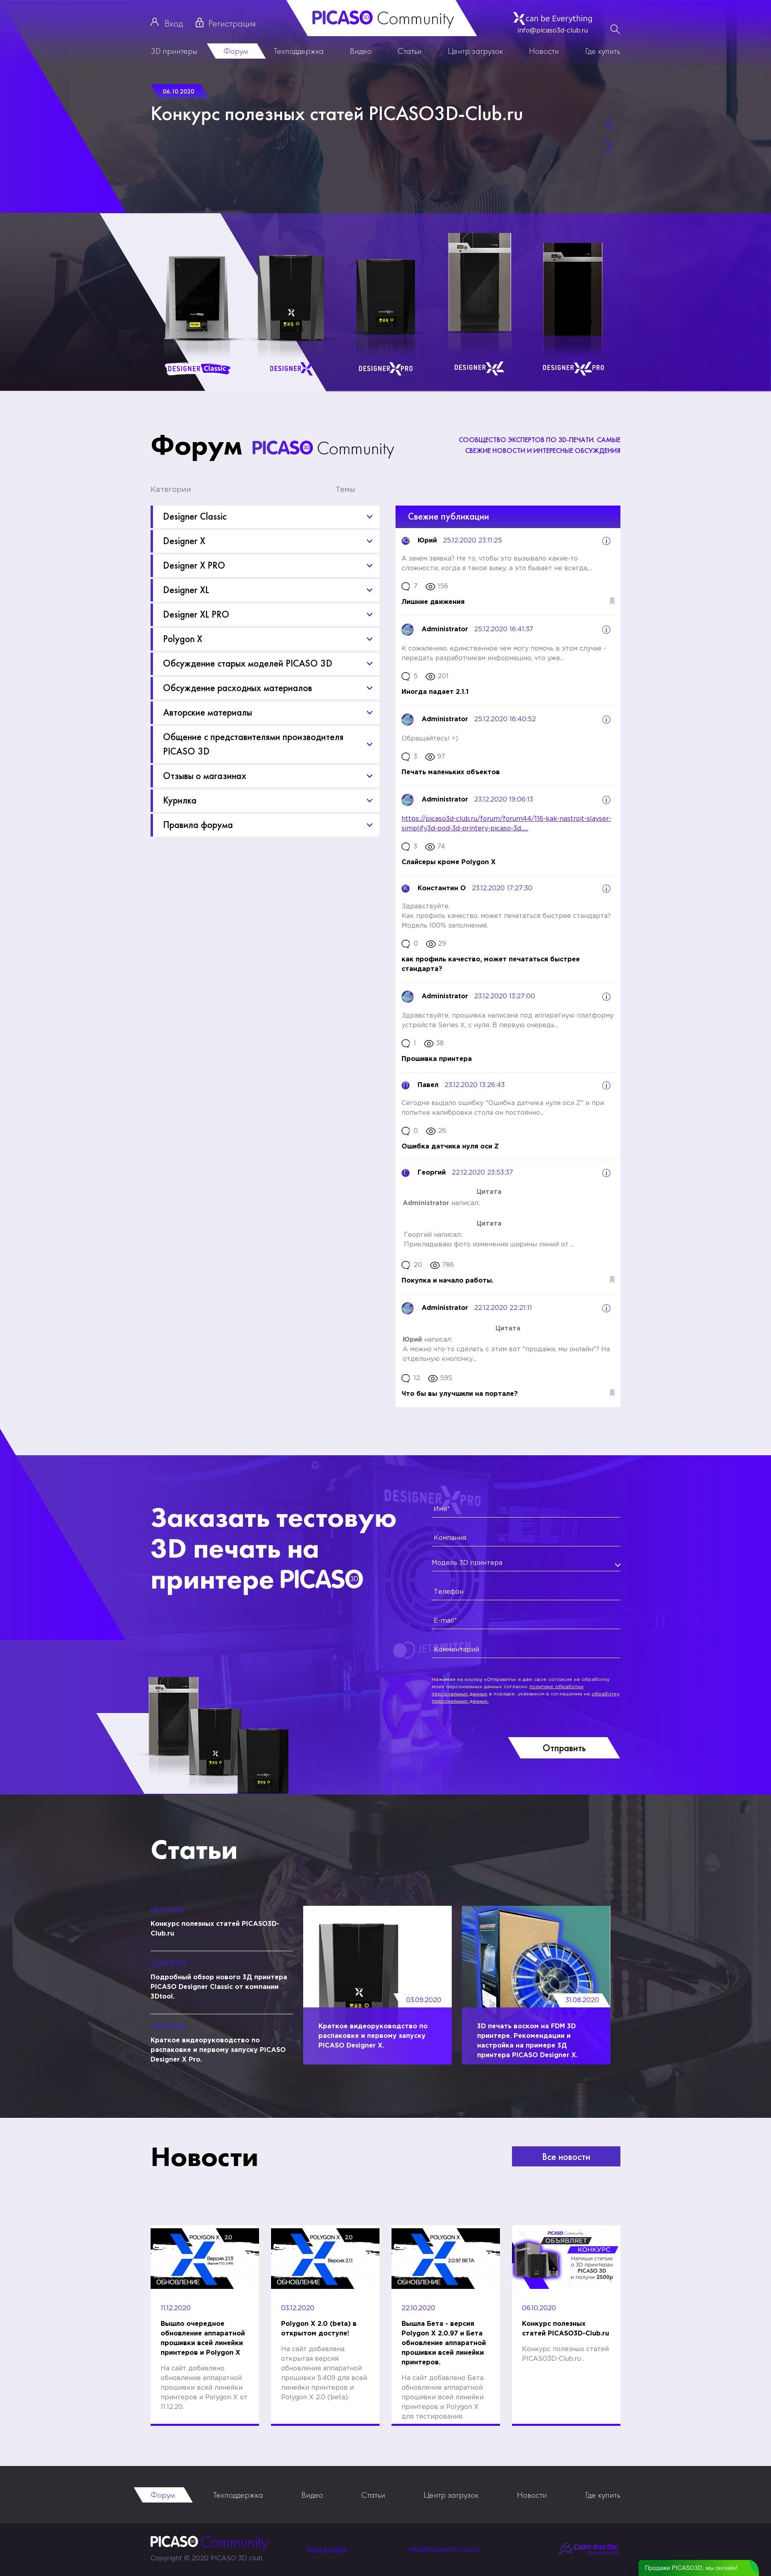 полноразмерный скриншот сайта https://picaso3d-club.ru/